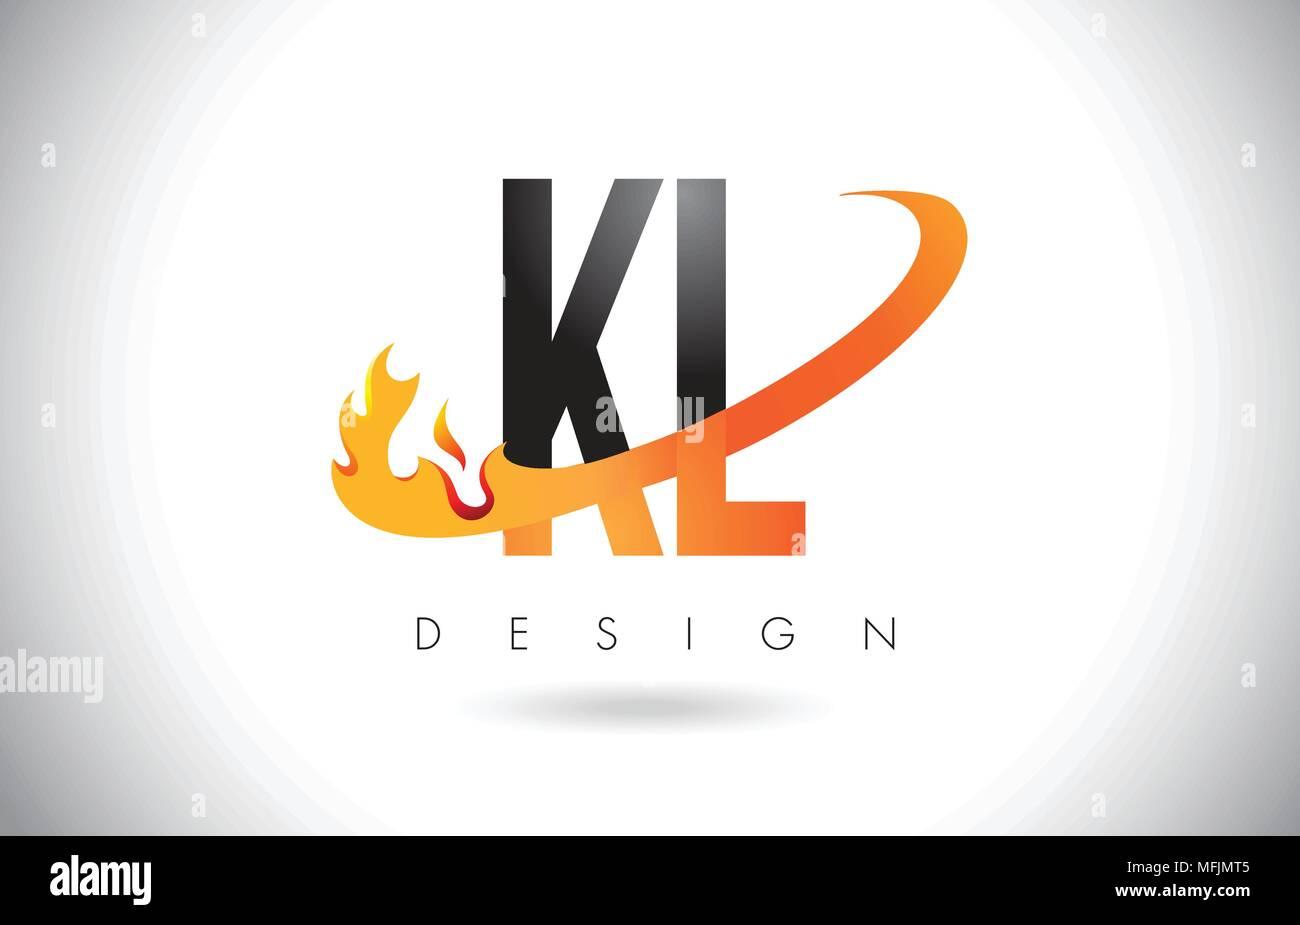 KL K L Letter Logo Design with Fire Flames and Orange Swoosh Vector Illustration. - Stock Vector